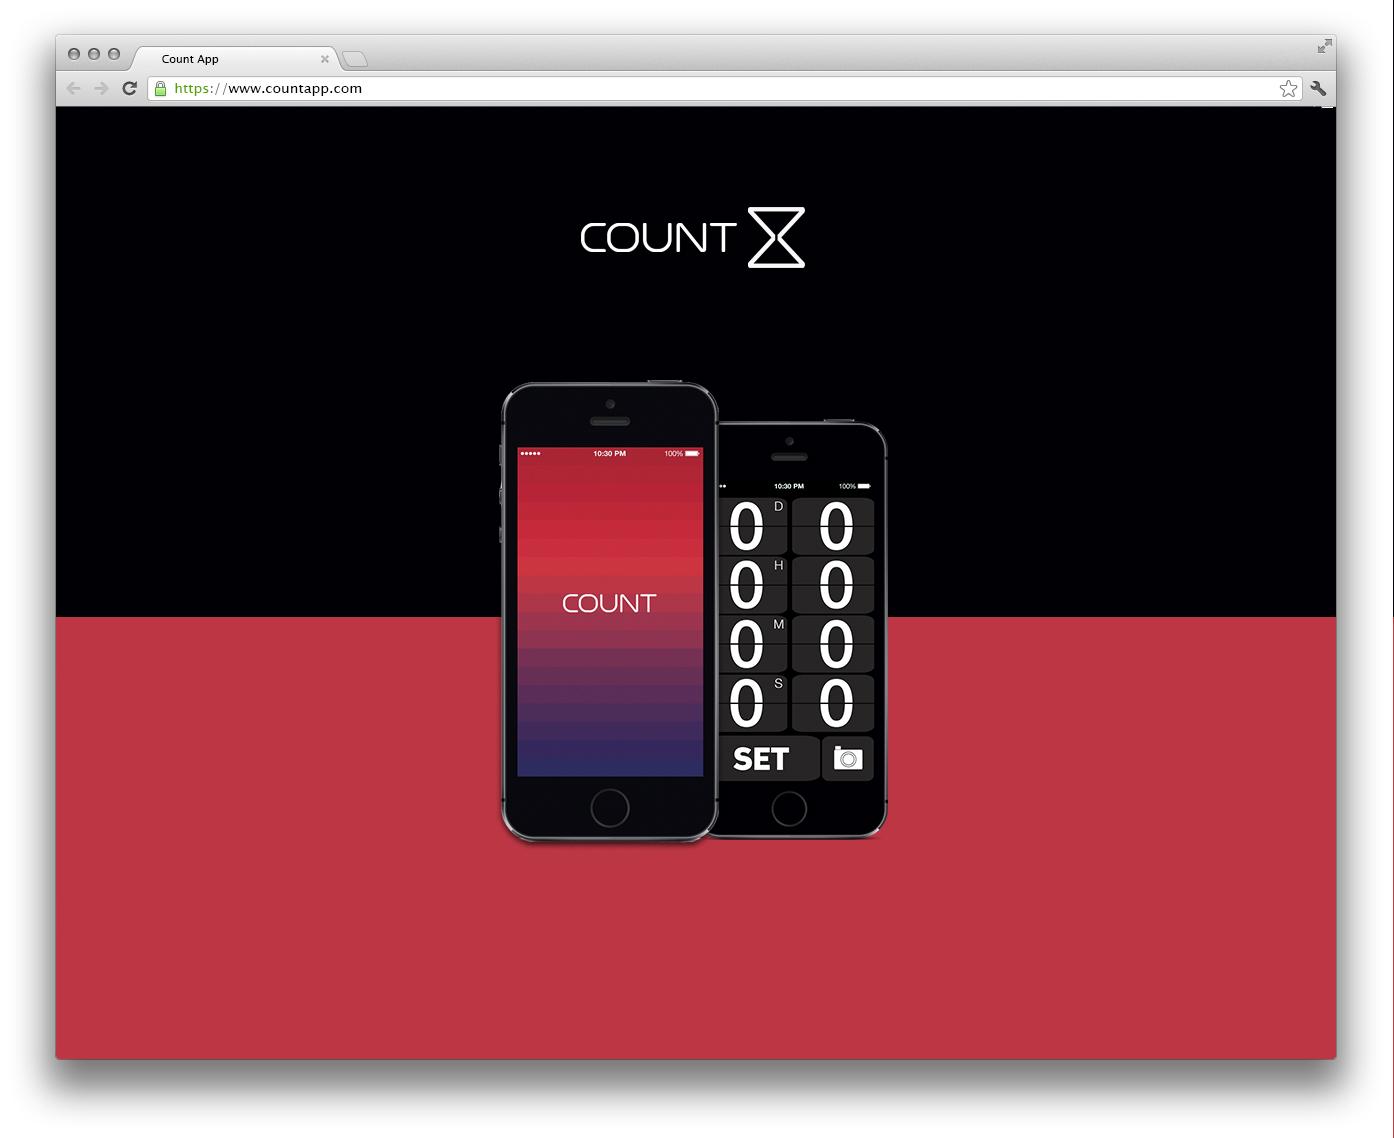 CountApp_Page_8.jpg